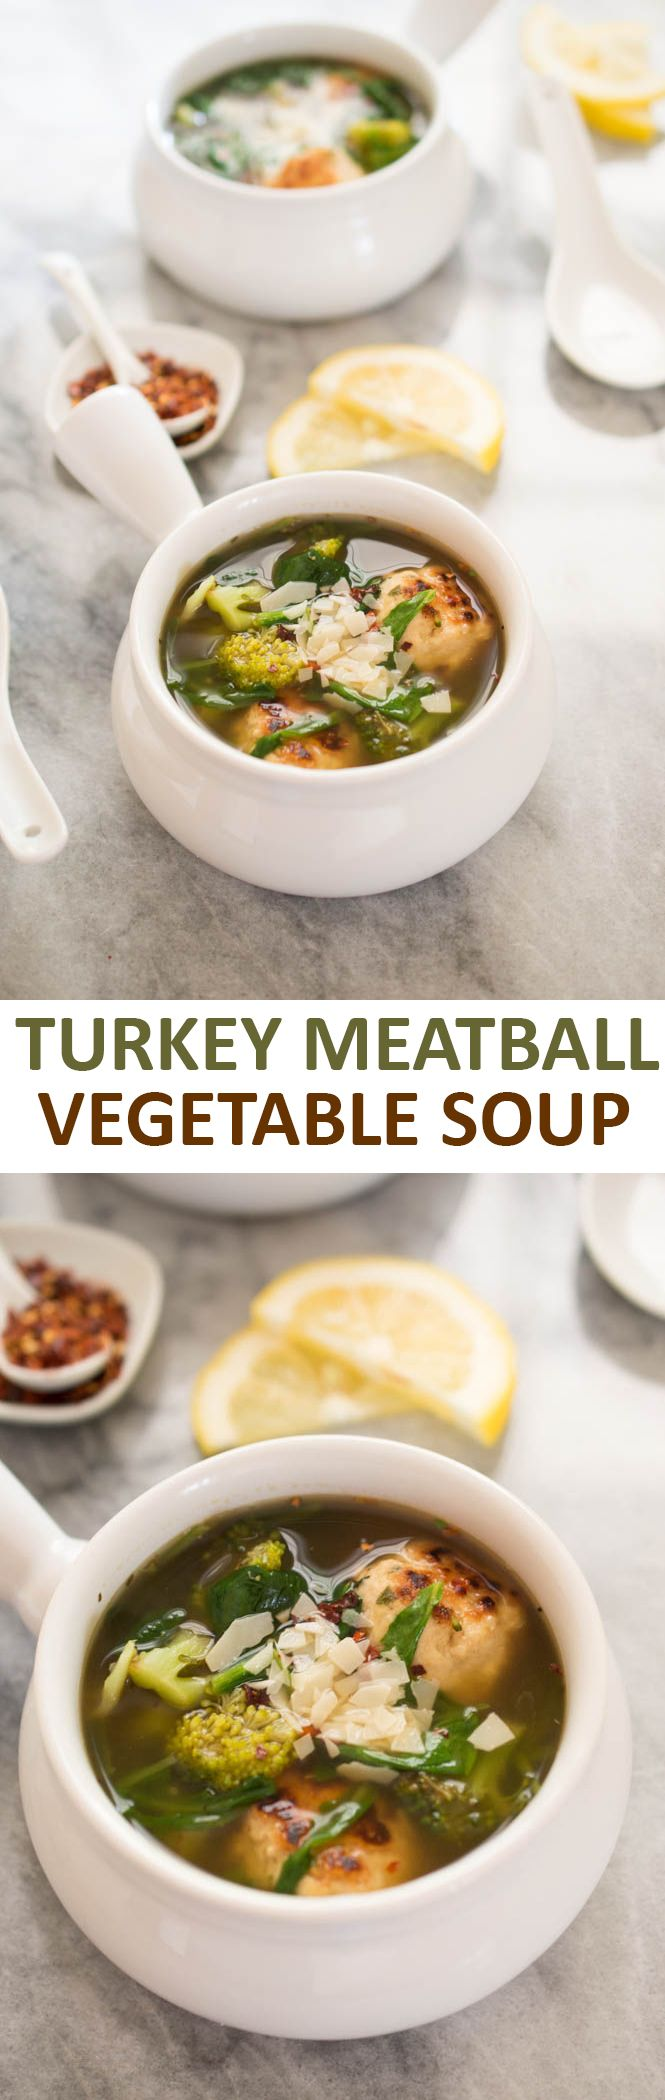 meatball vegetable turkey meatball vegetable soups arugula spinach ...